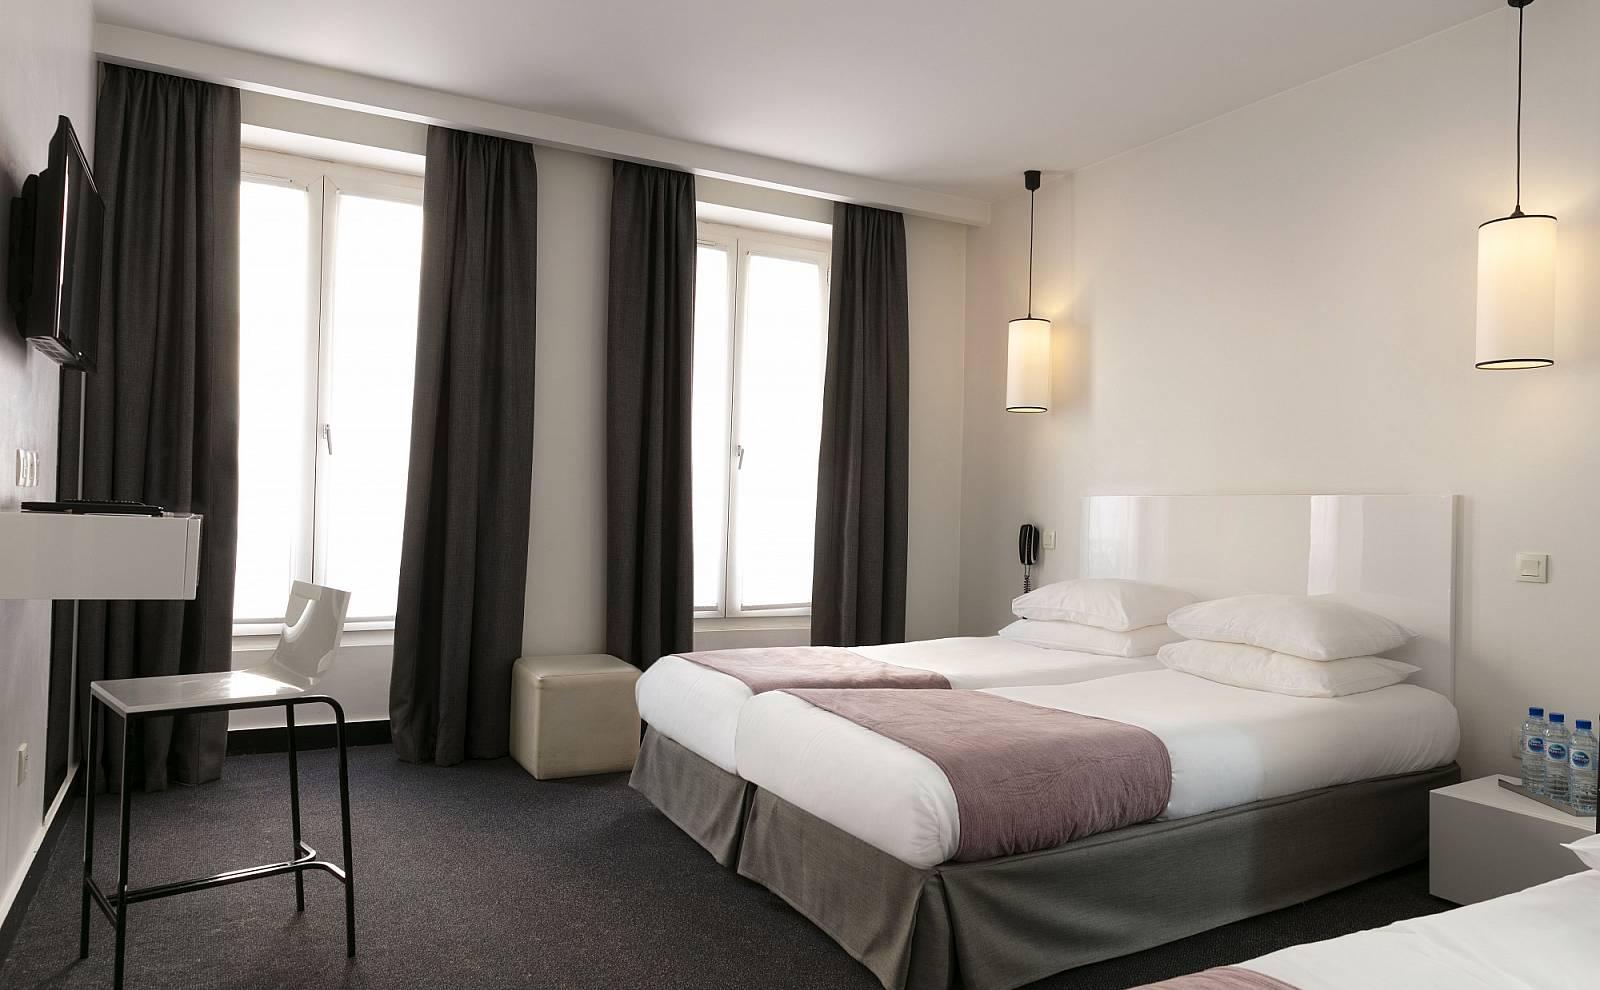 chambres standard design h tel h tel paris bastille On standard design hotel paris bastille